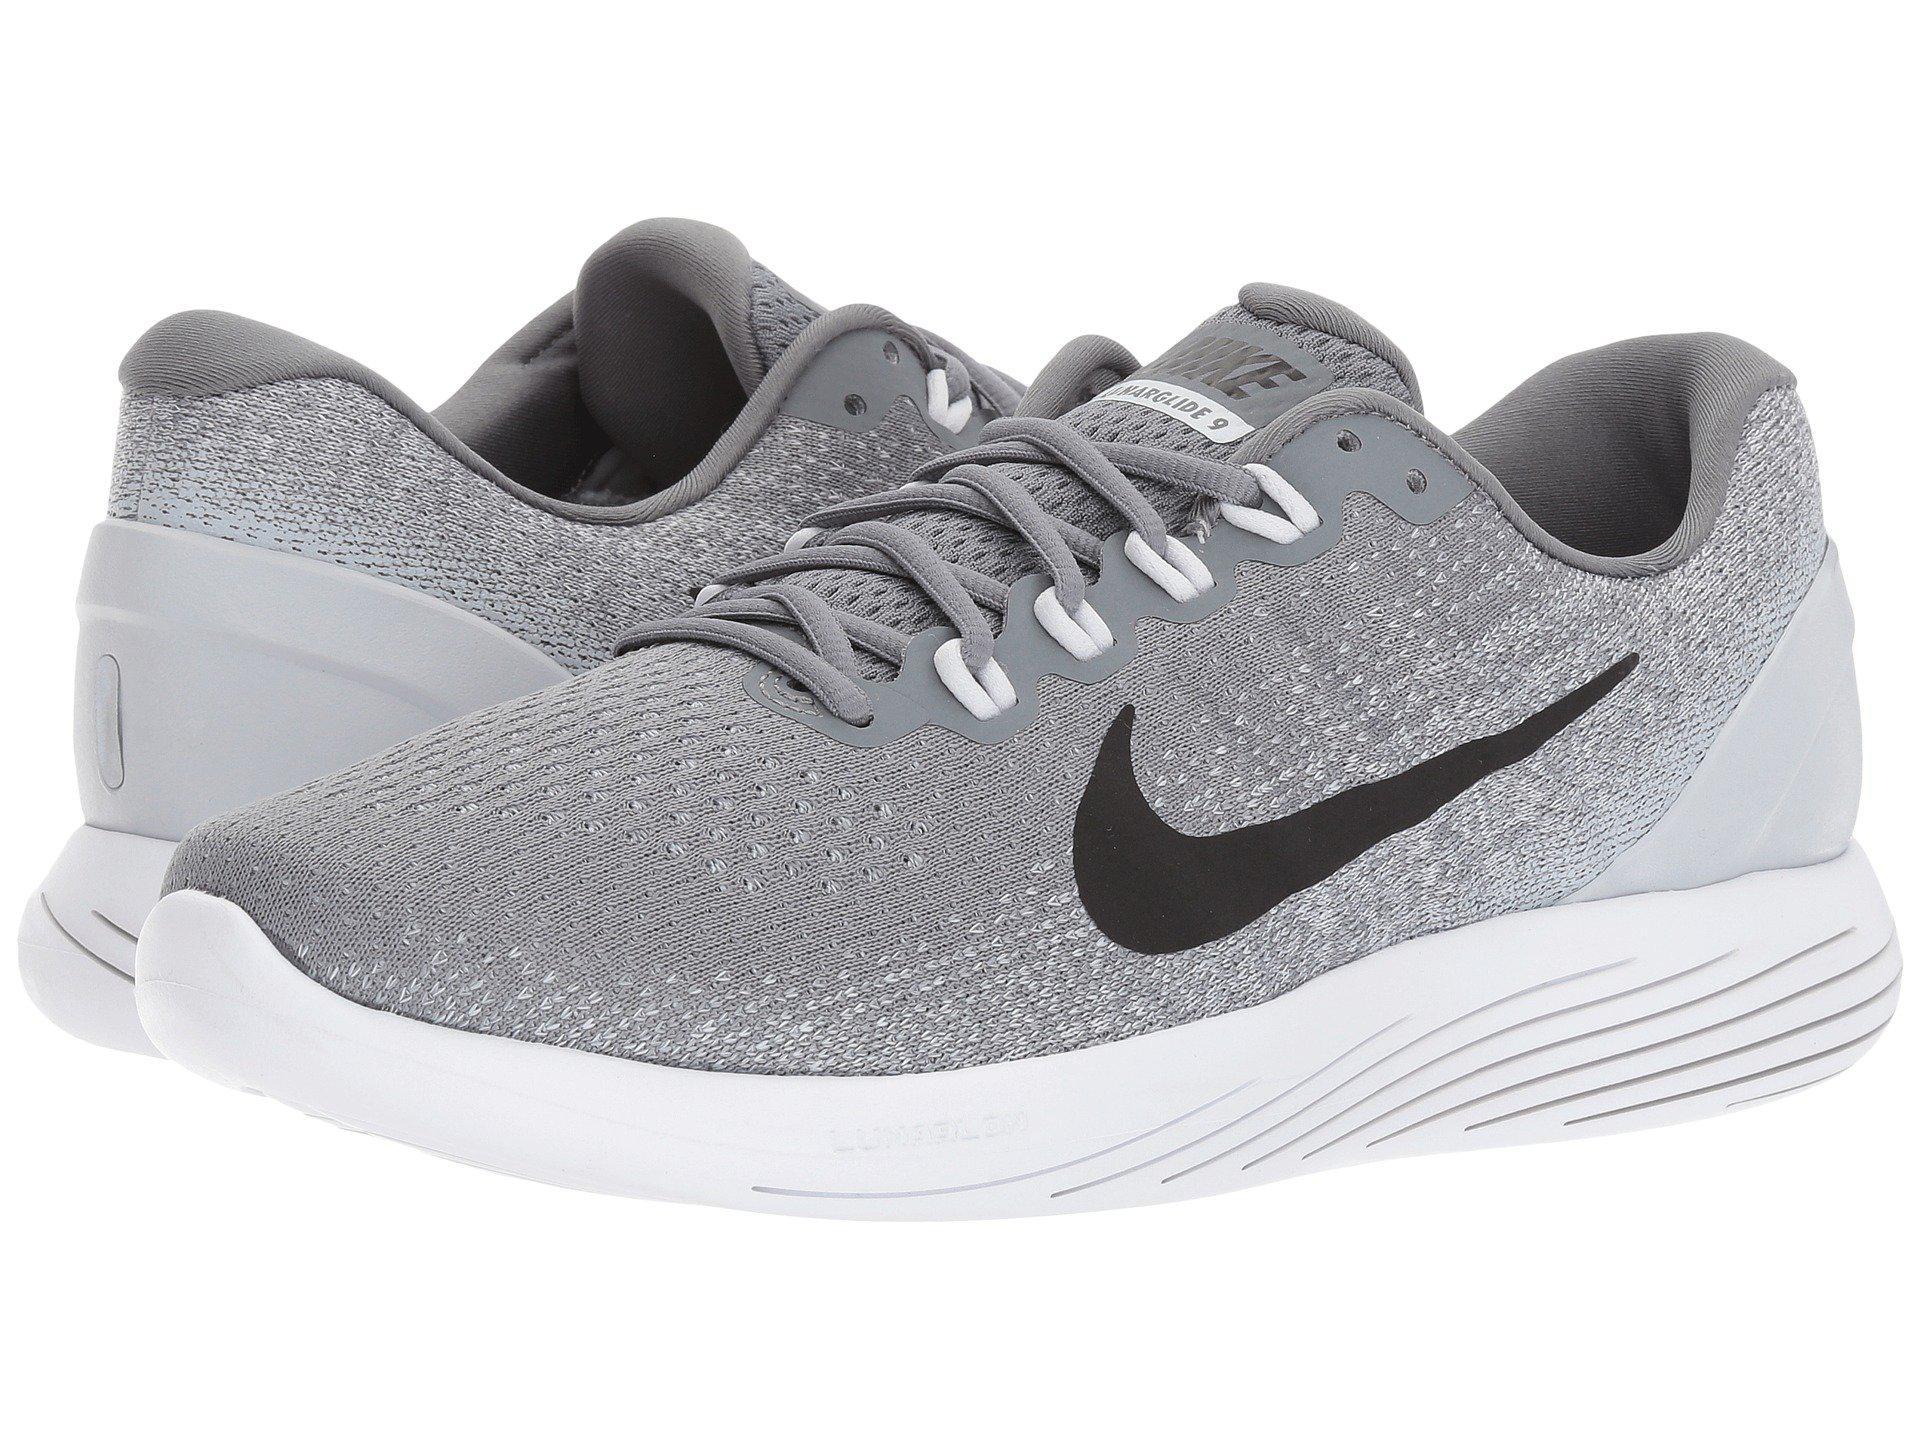 Nike PerformanceLUNARGLIDE 9 - Stabilty running shoes - black hR9ItNvO